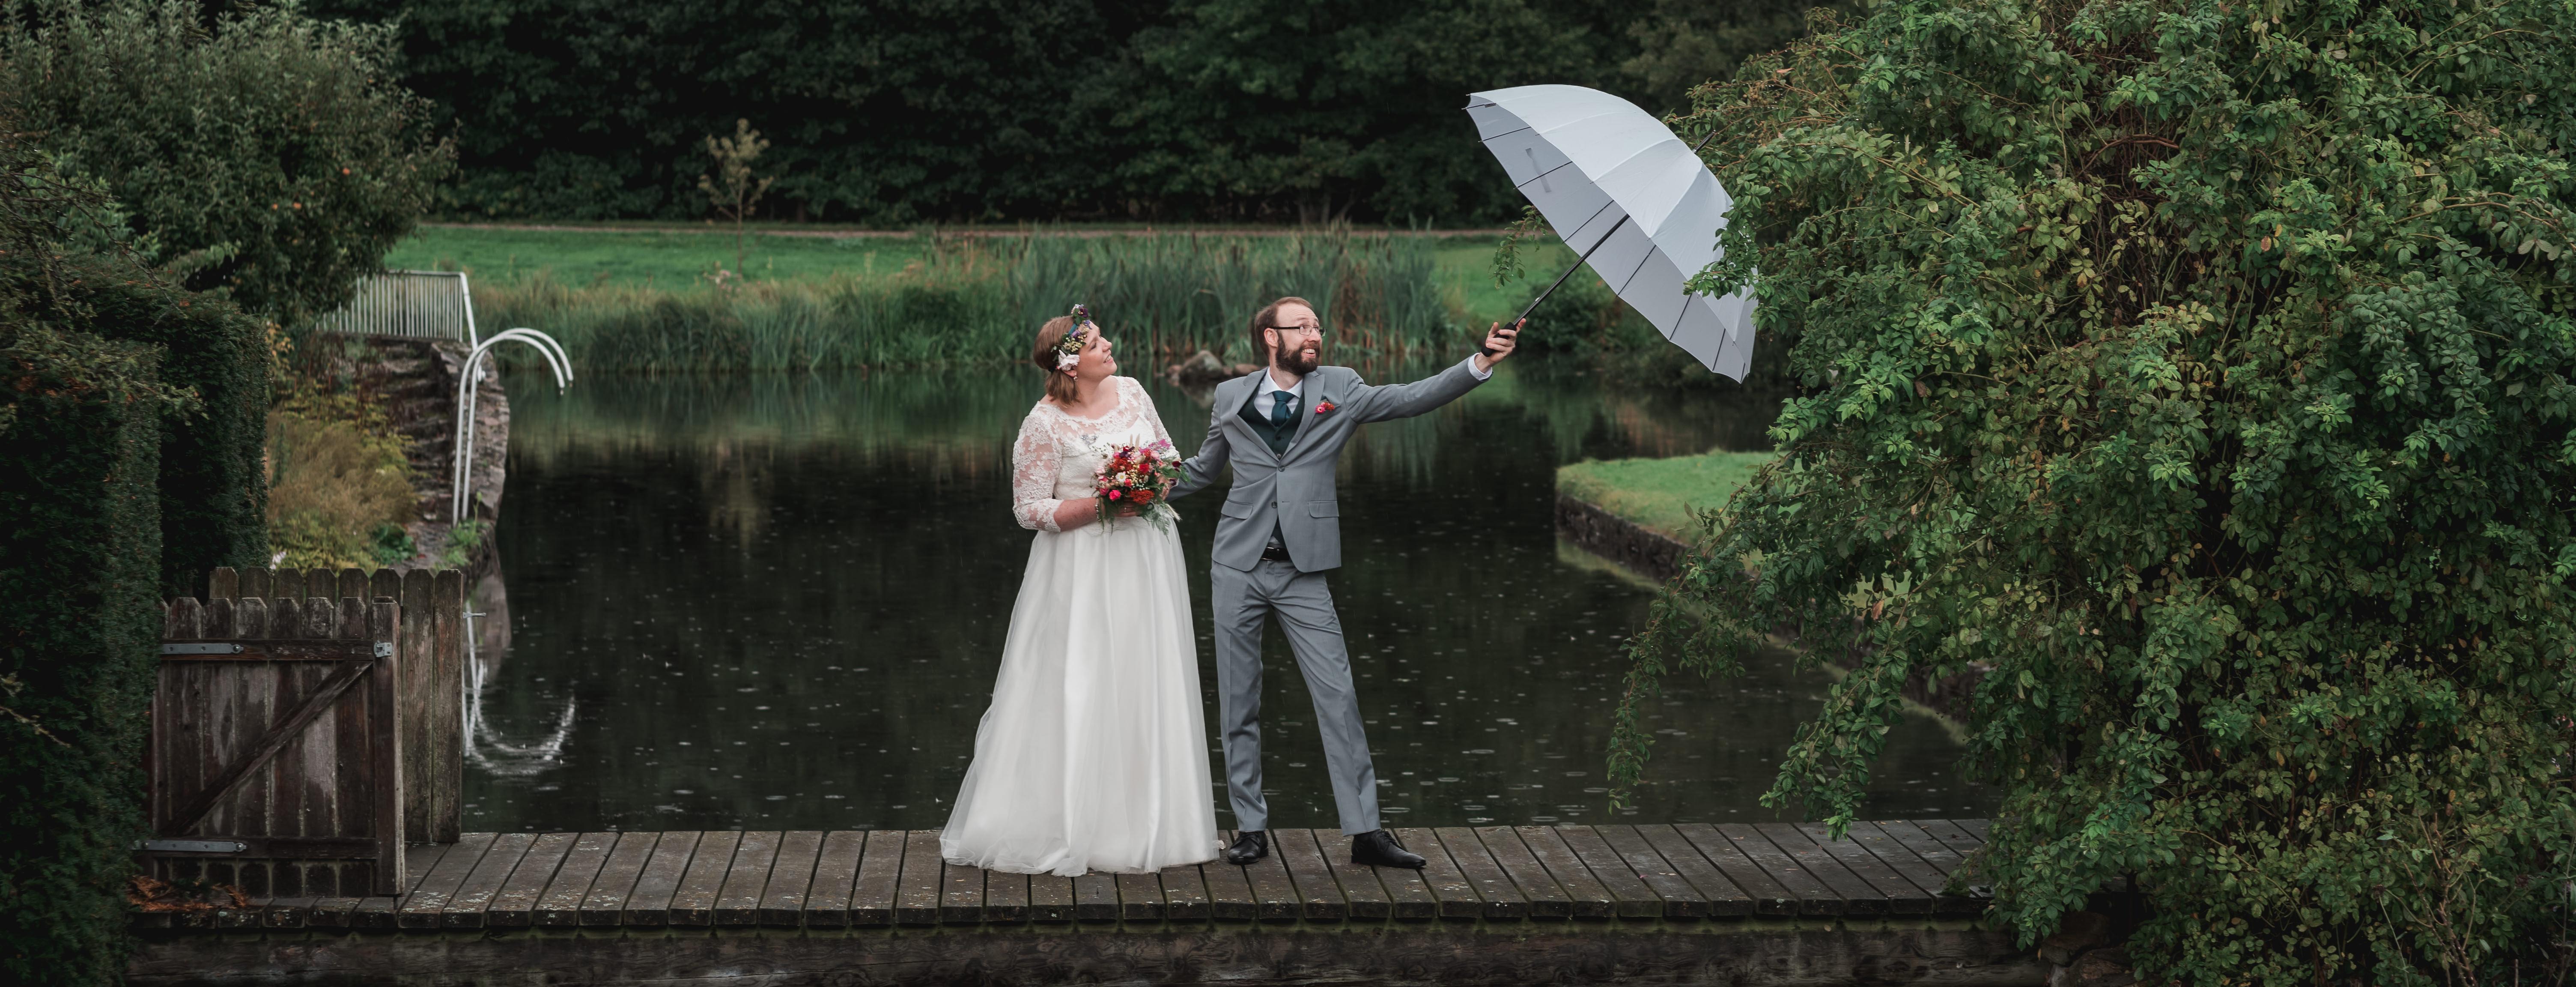 wedding_2020_102